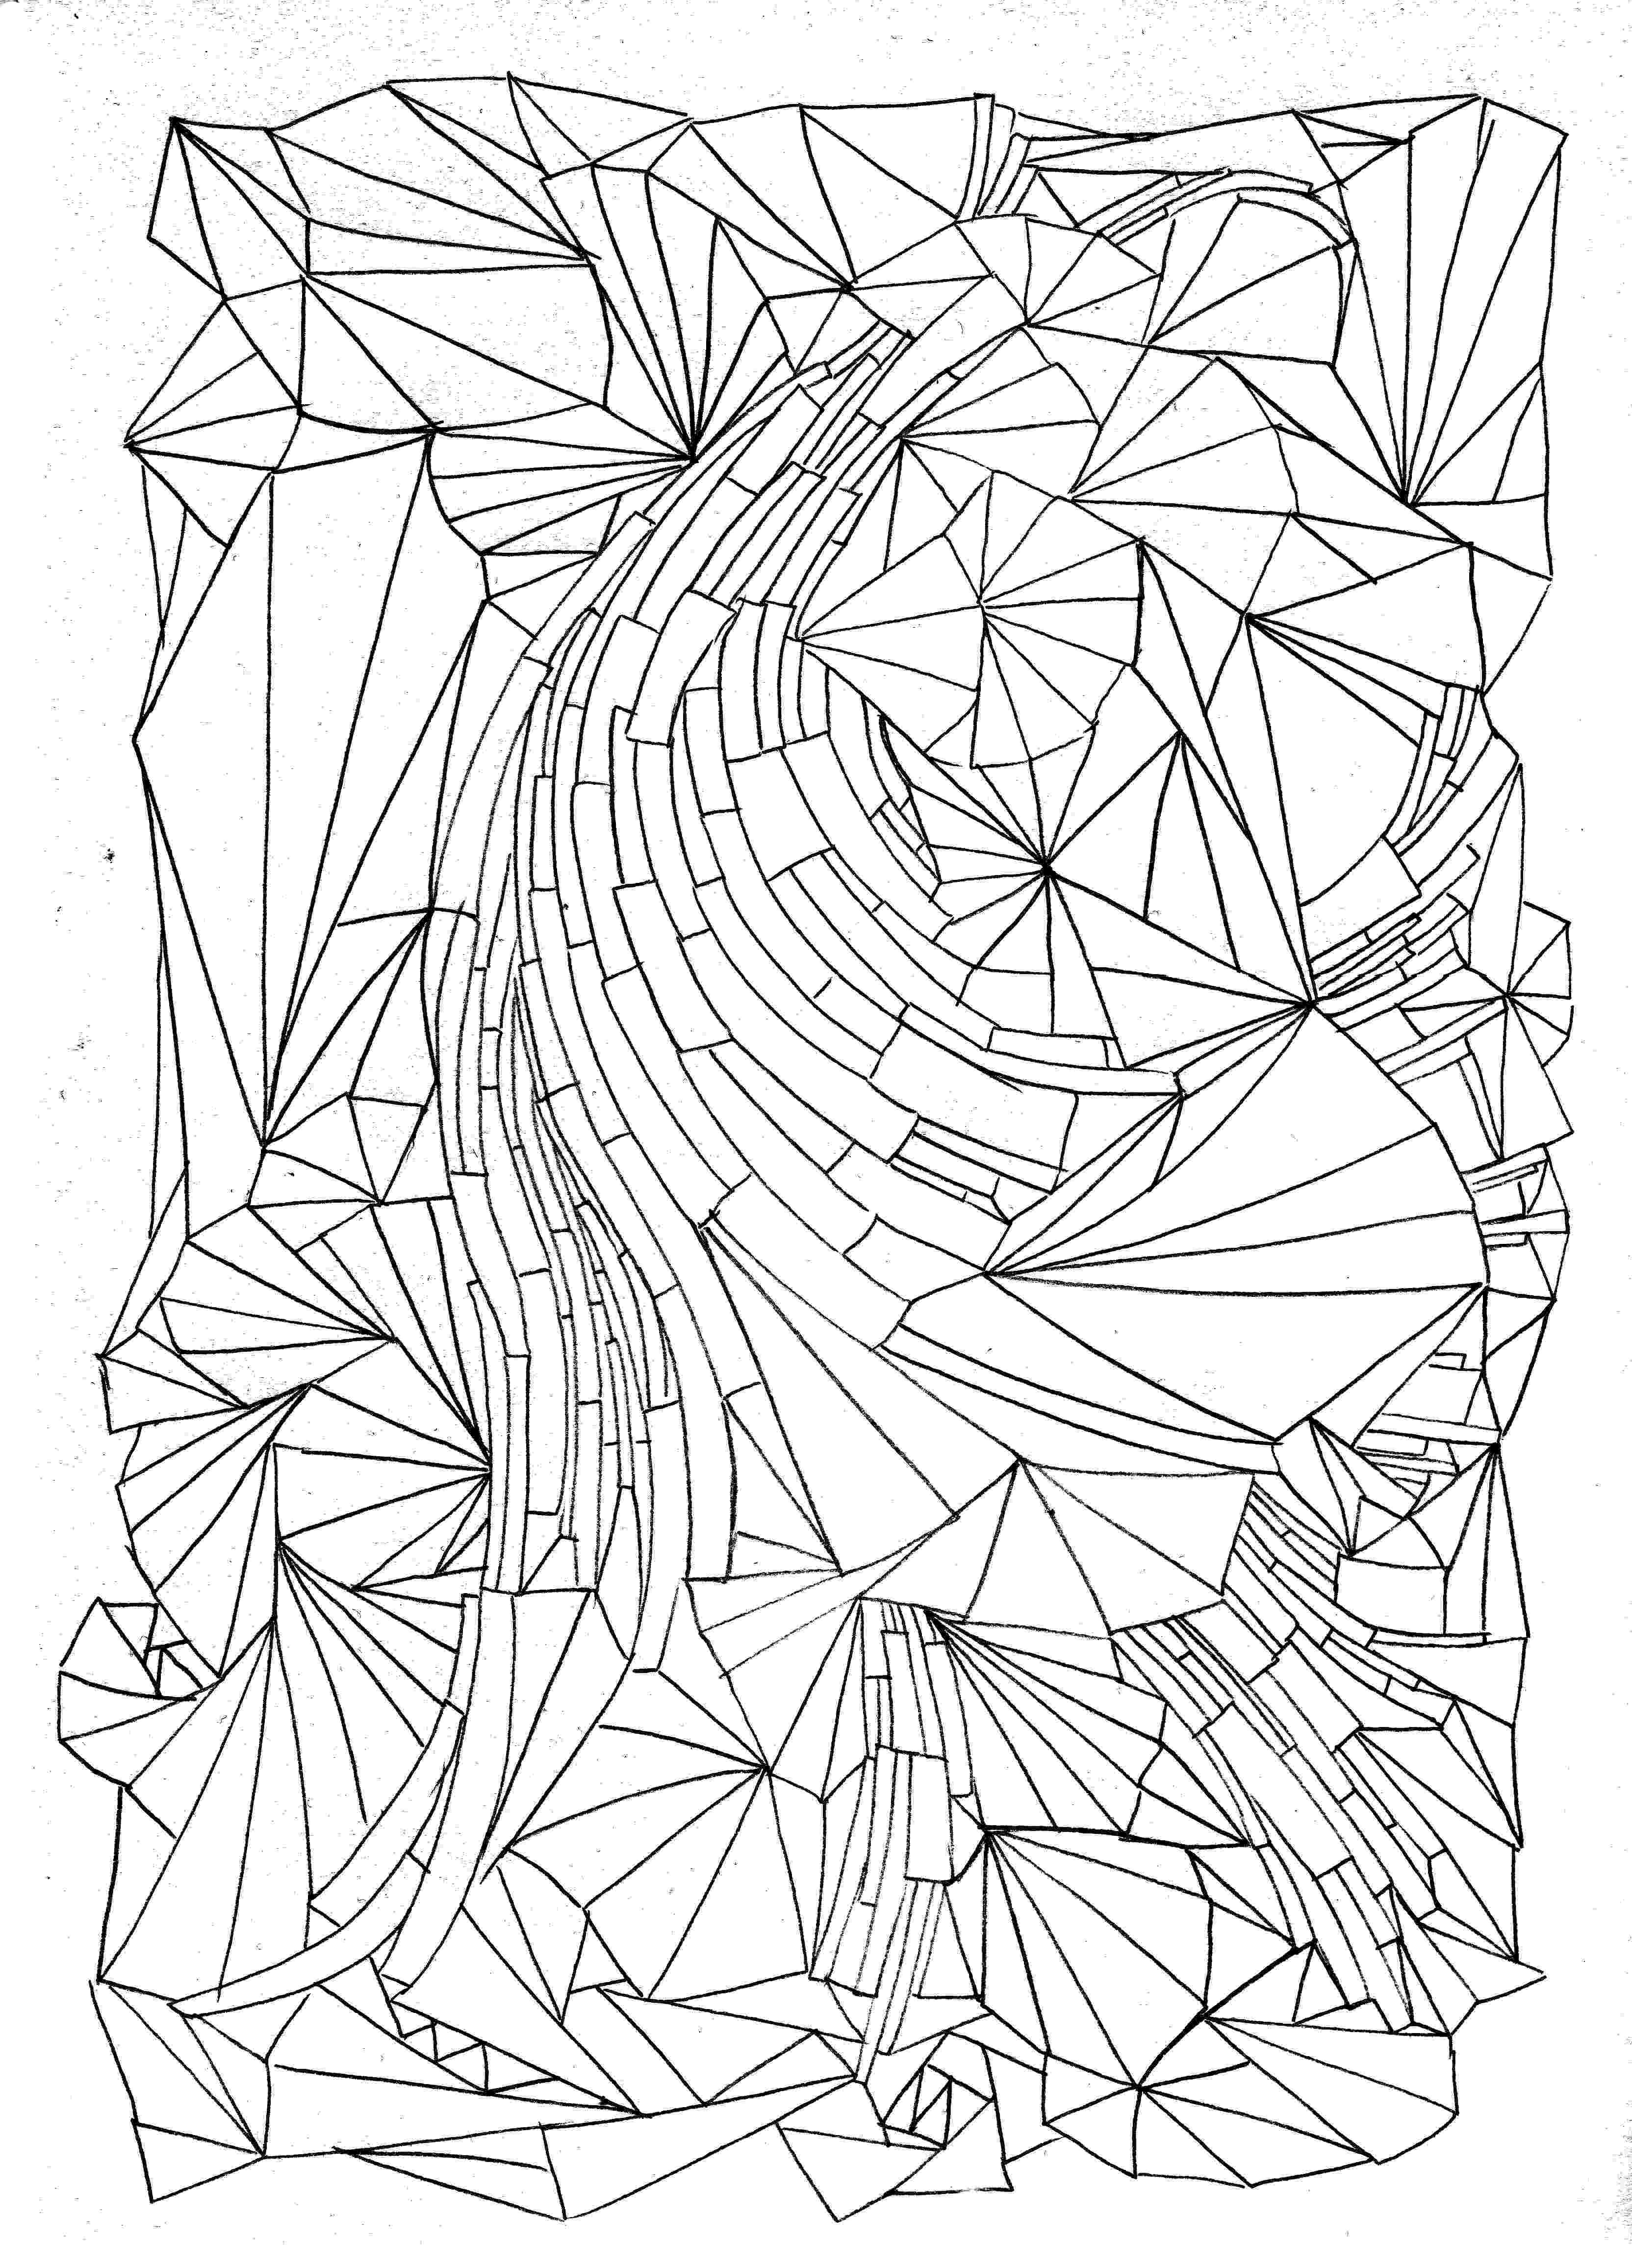 printable coloring designs colouring designs thelinoprinter printable coloring designs